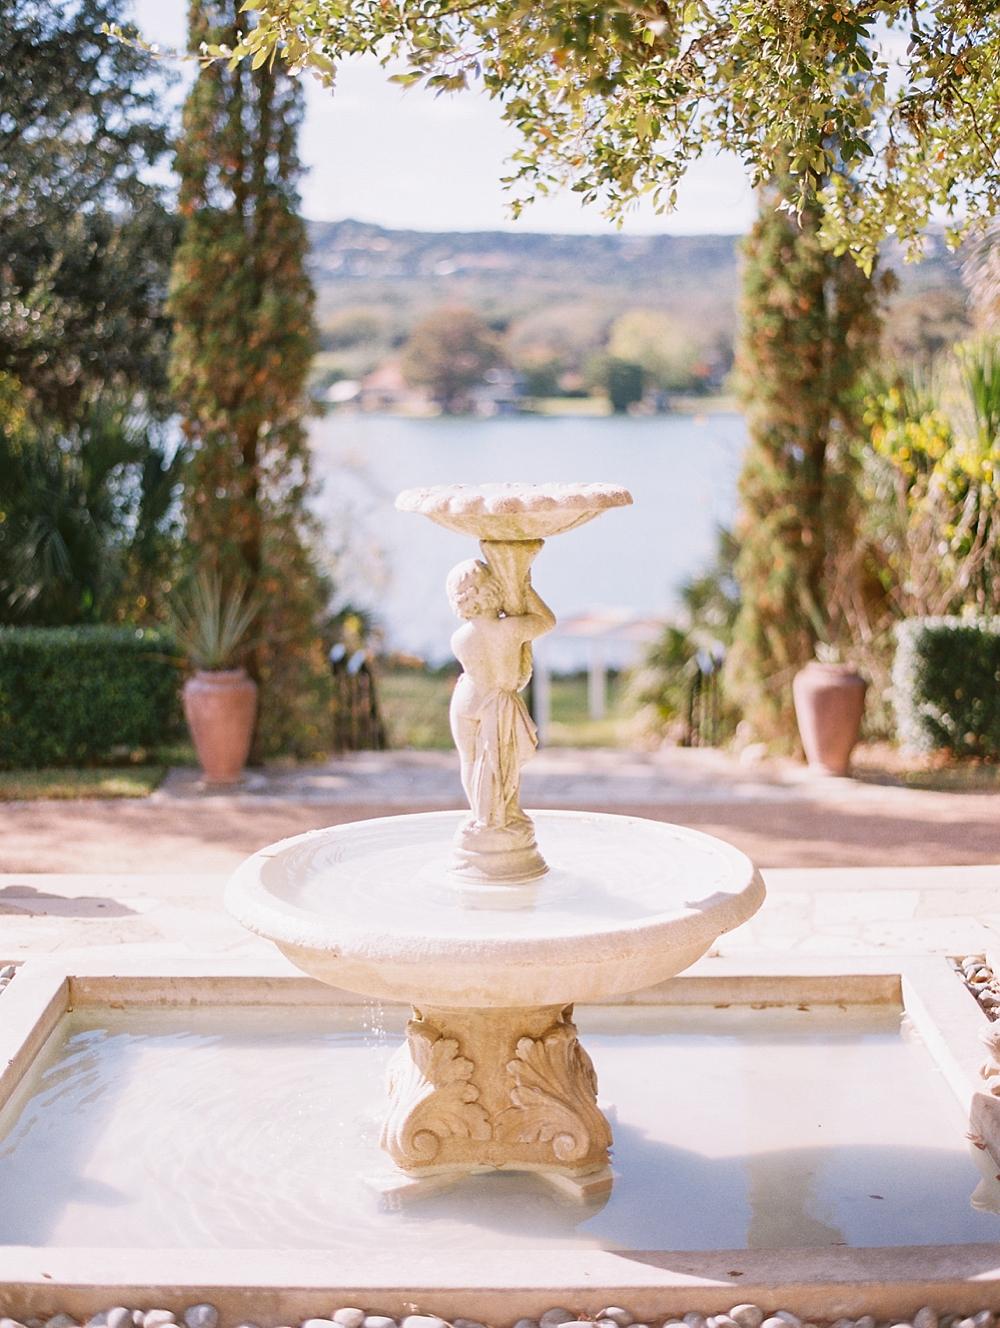 kristin-la-voie-photography-Austin-Wedding-Photographer-laguna-gloria-commodore-perry-estate-engagement-100